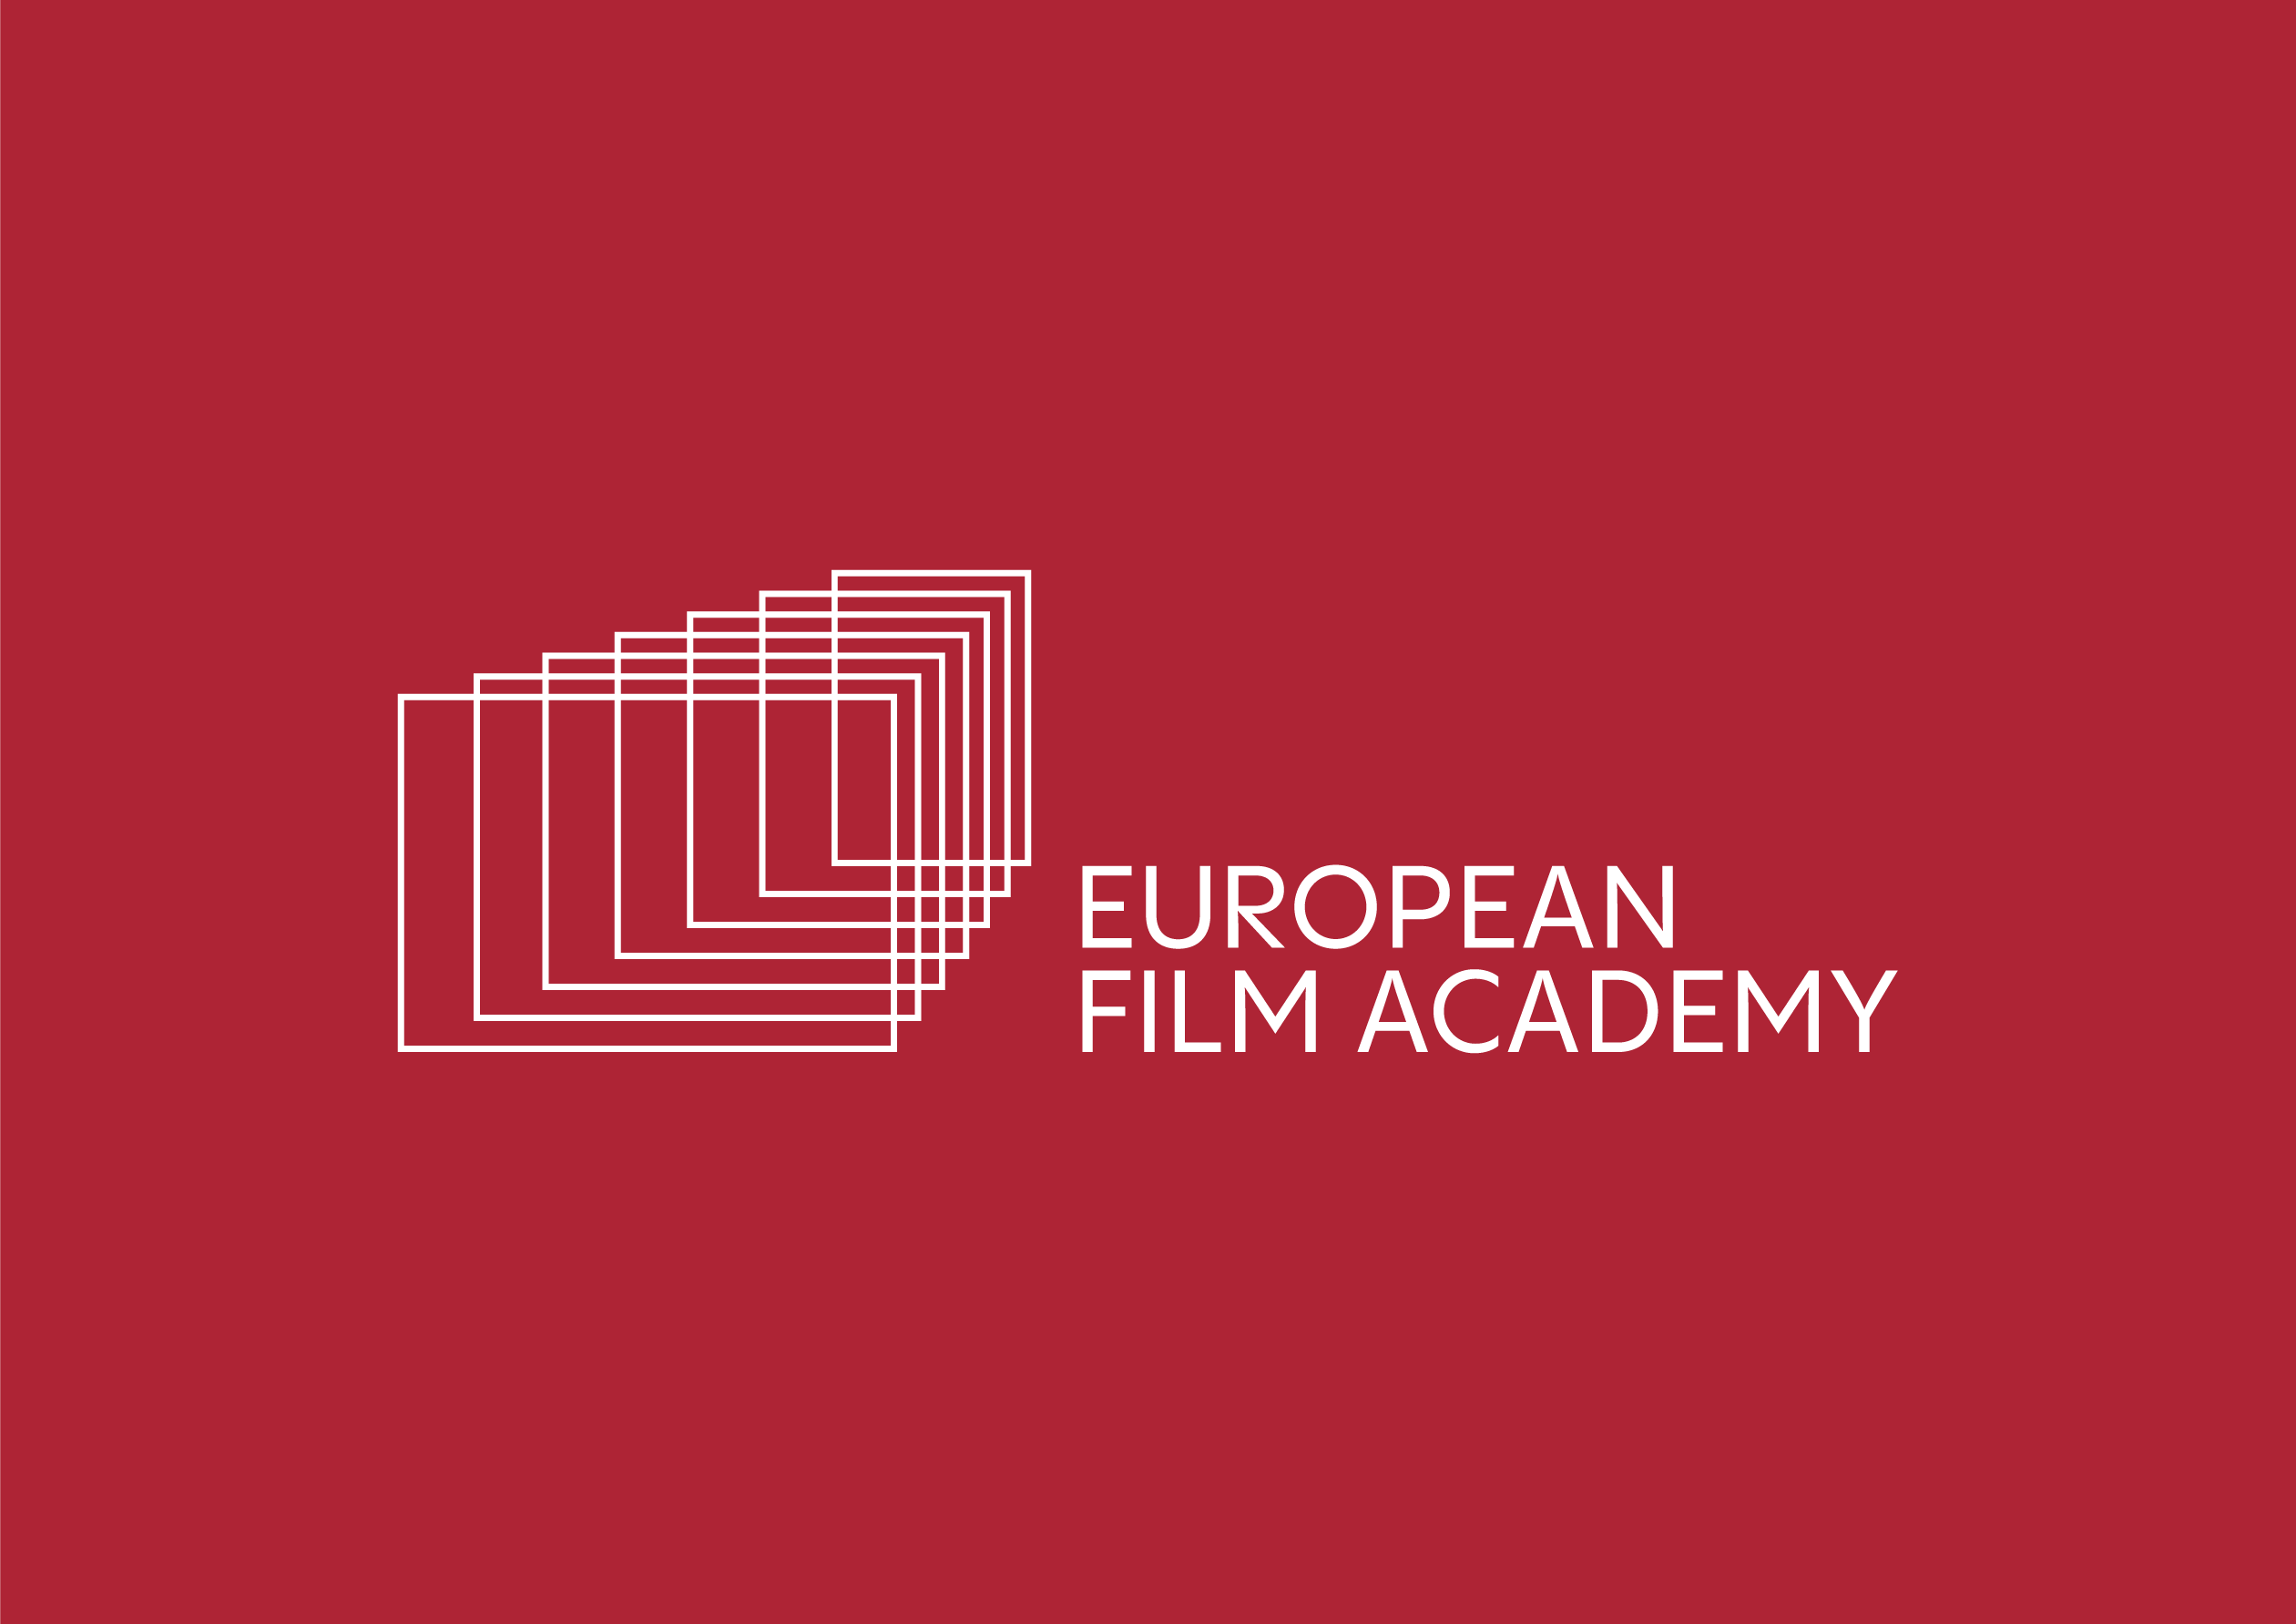 EFA_logotype_Horizontal_White+Burgundy